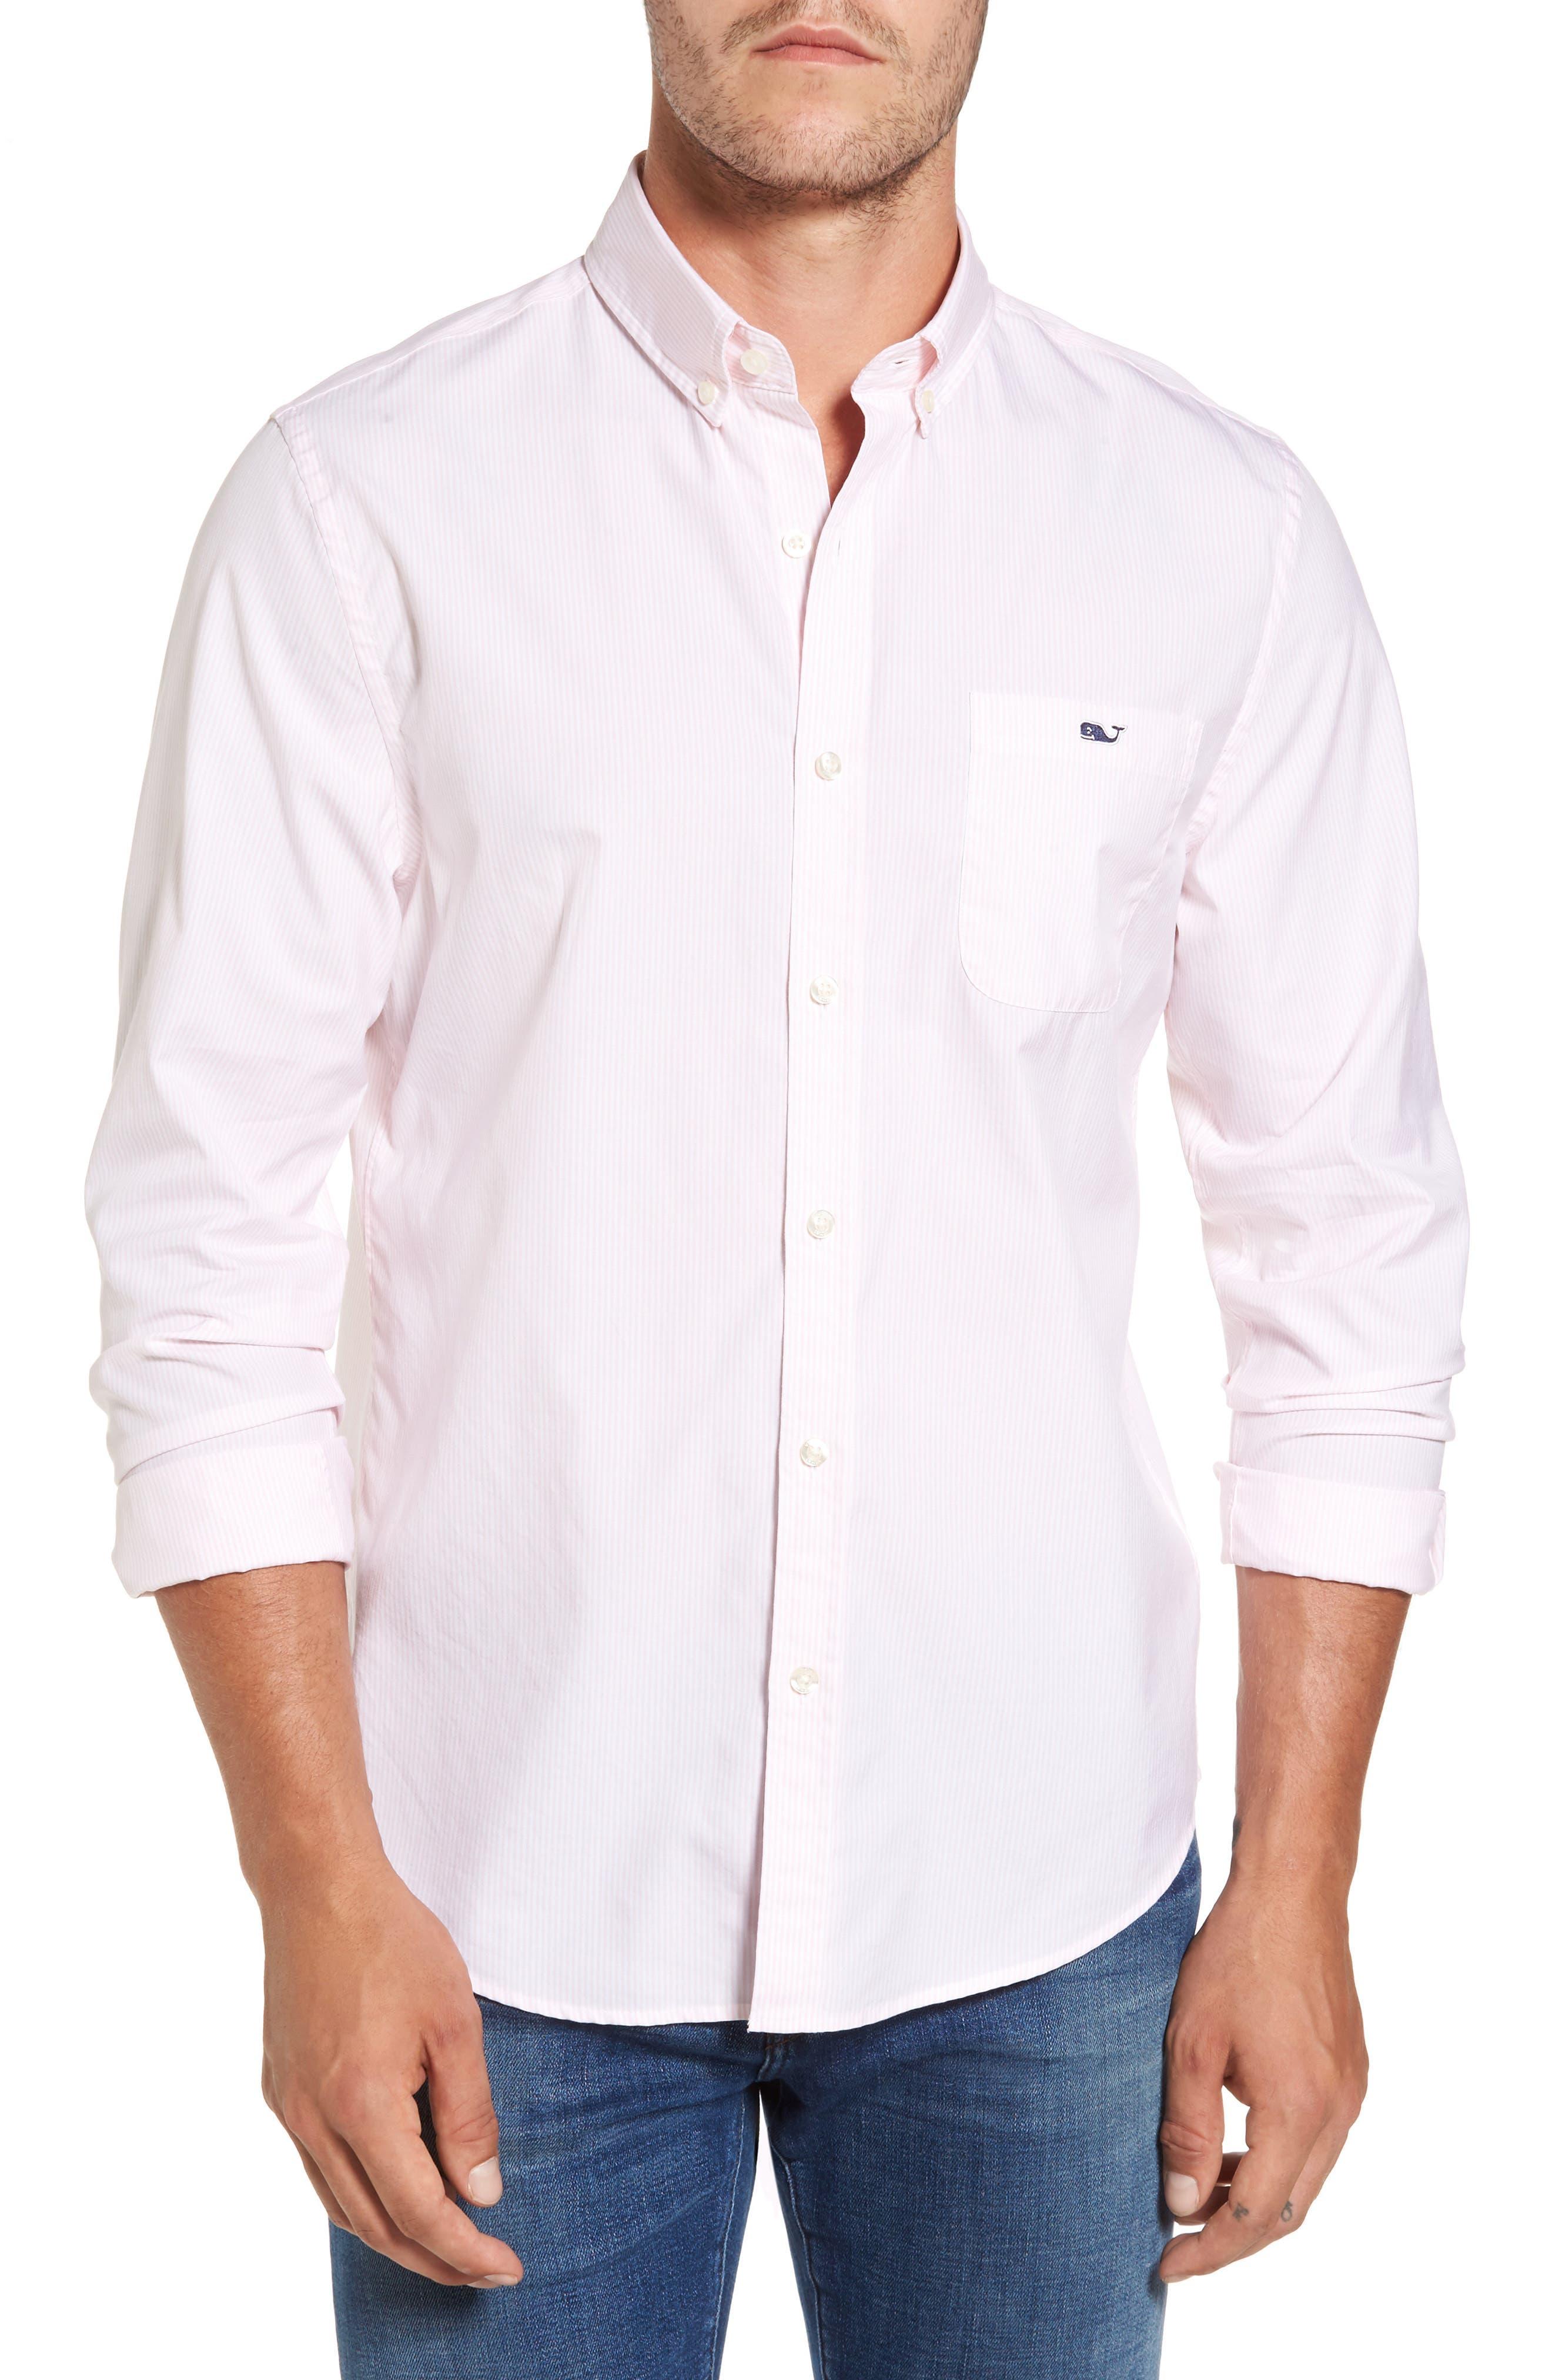 Main Image - vineyard vines Seabird Stripe Tucker Slim Fit Sport Shirt